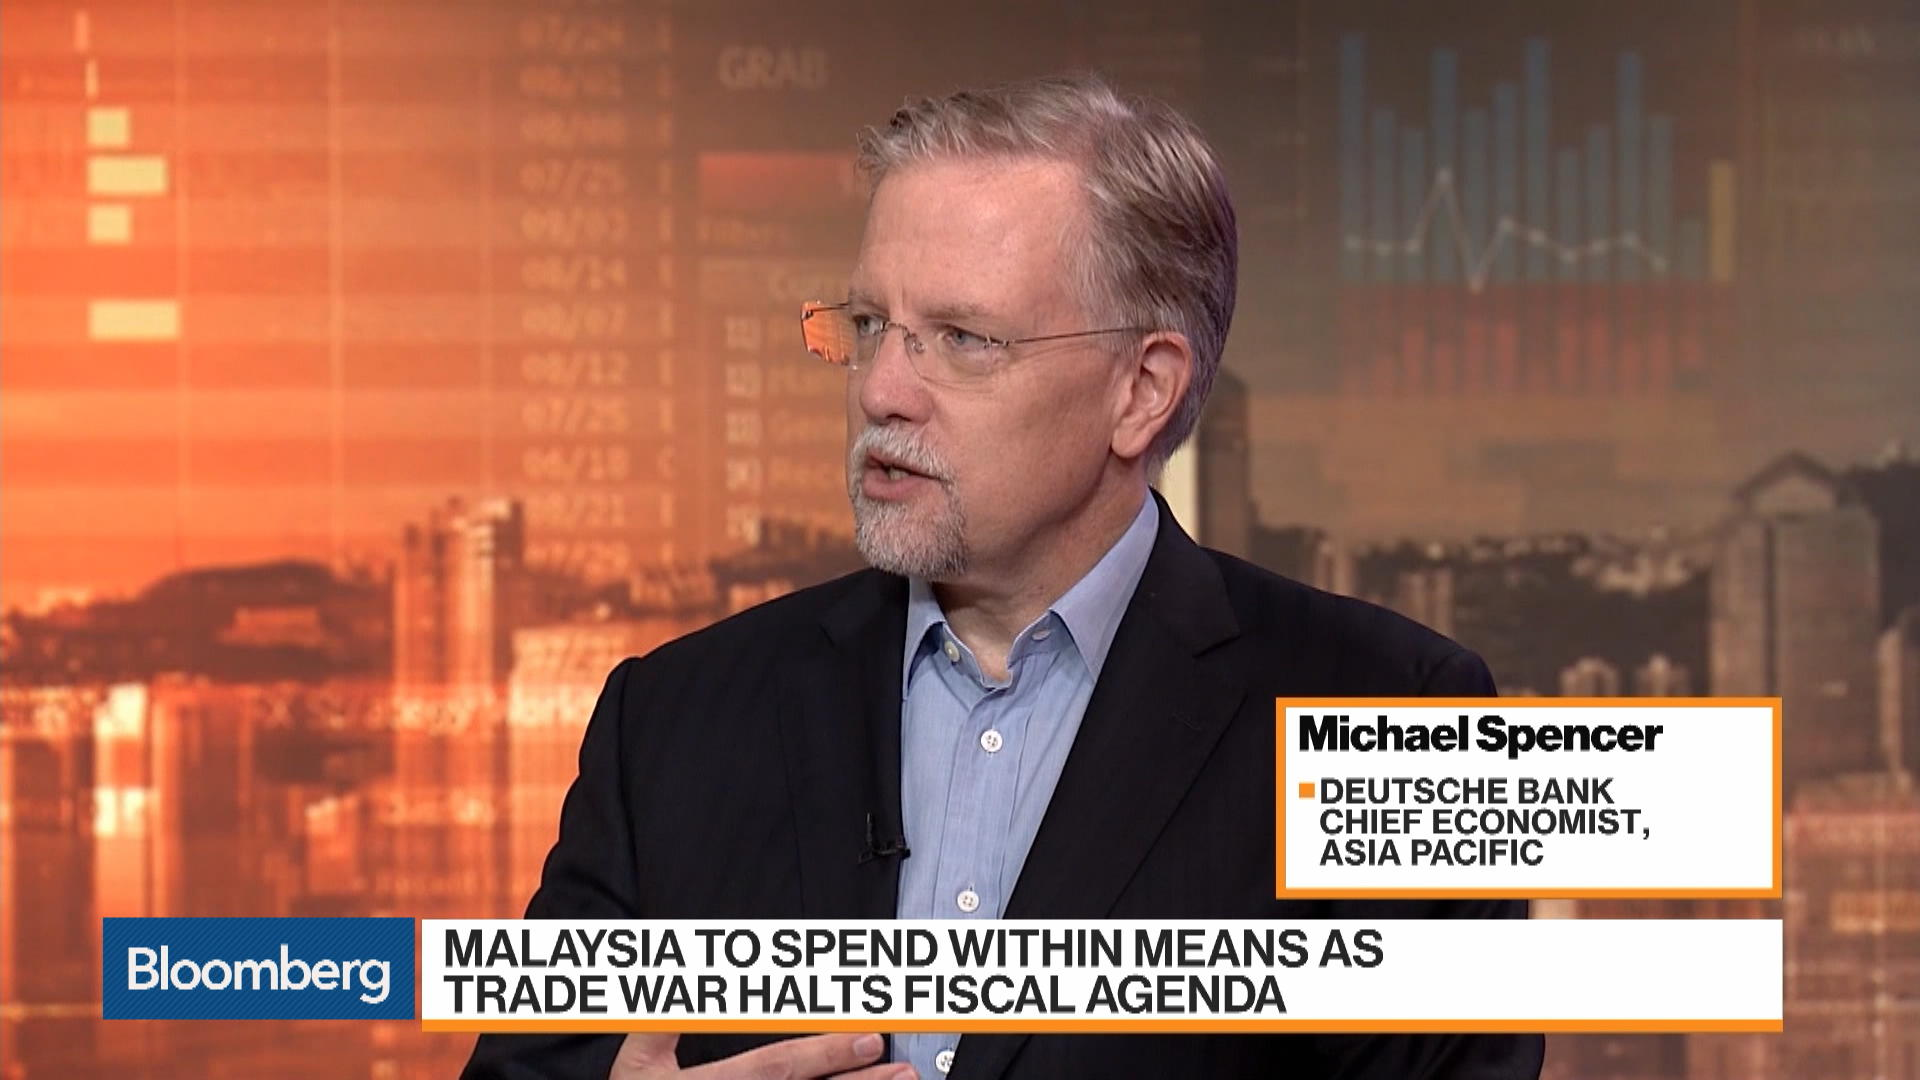 Michael Spencer, chief economist for Asia Pacific at Deutsche Bank, on Economies, Policies